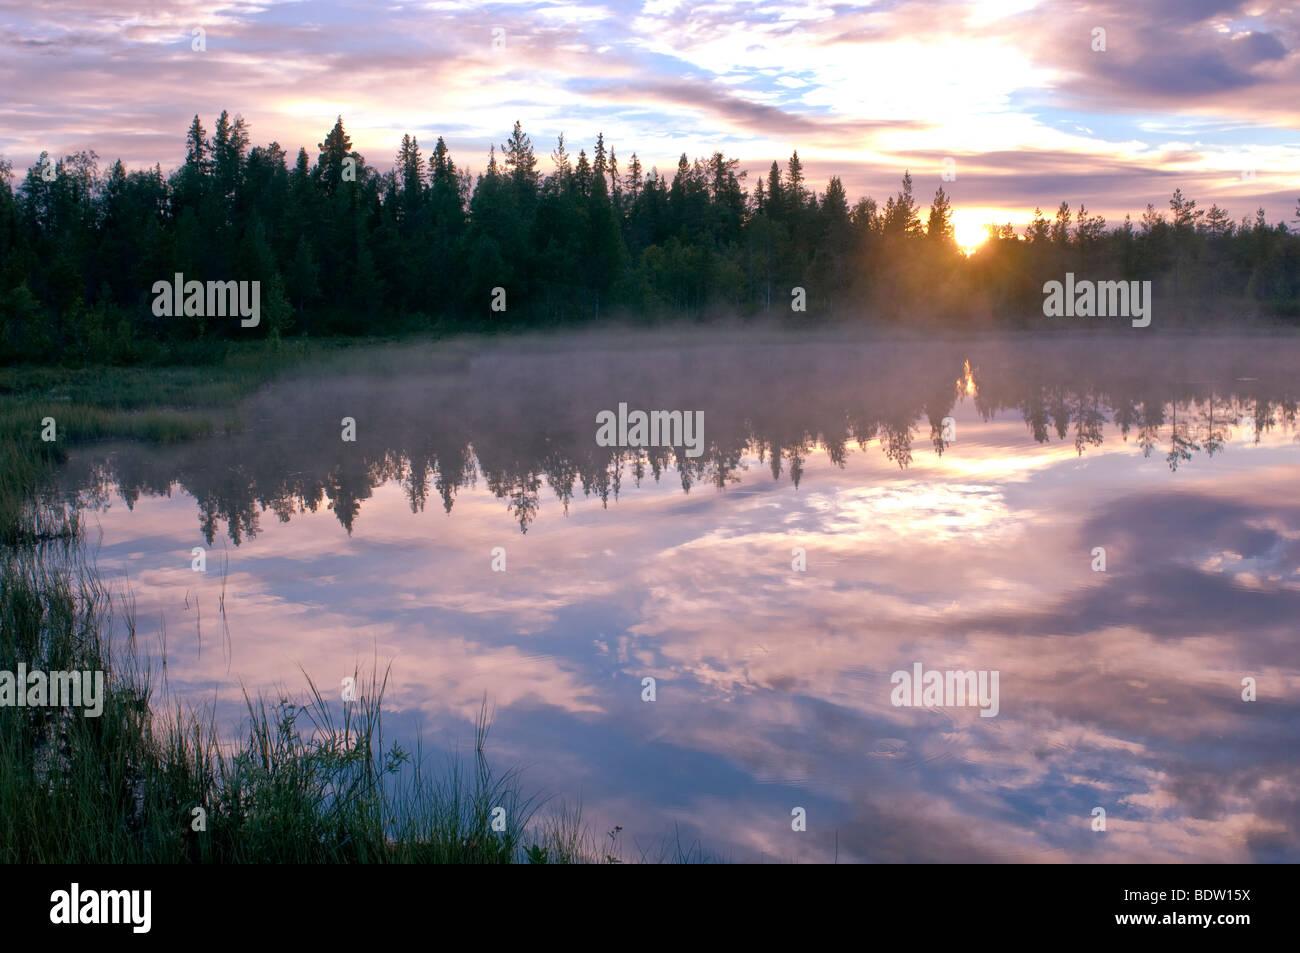 sonnenuntergang ueber see in lappland, schweden, lake at sunset in lapland, sweden Stock Photo